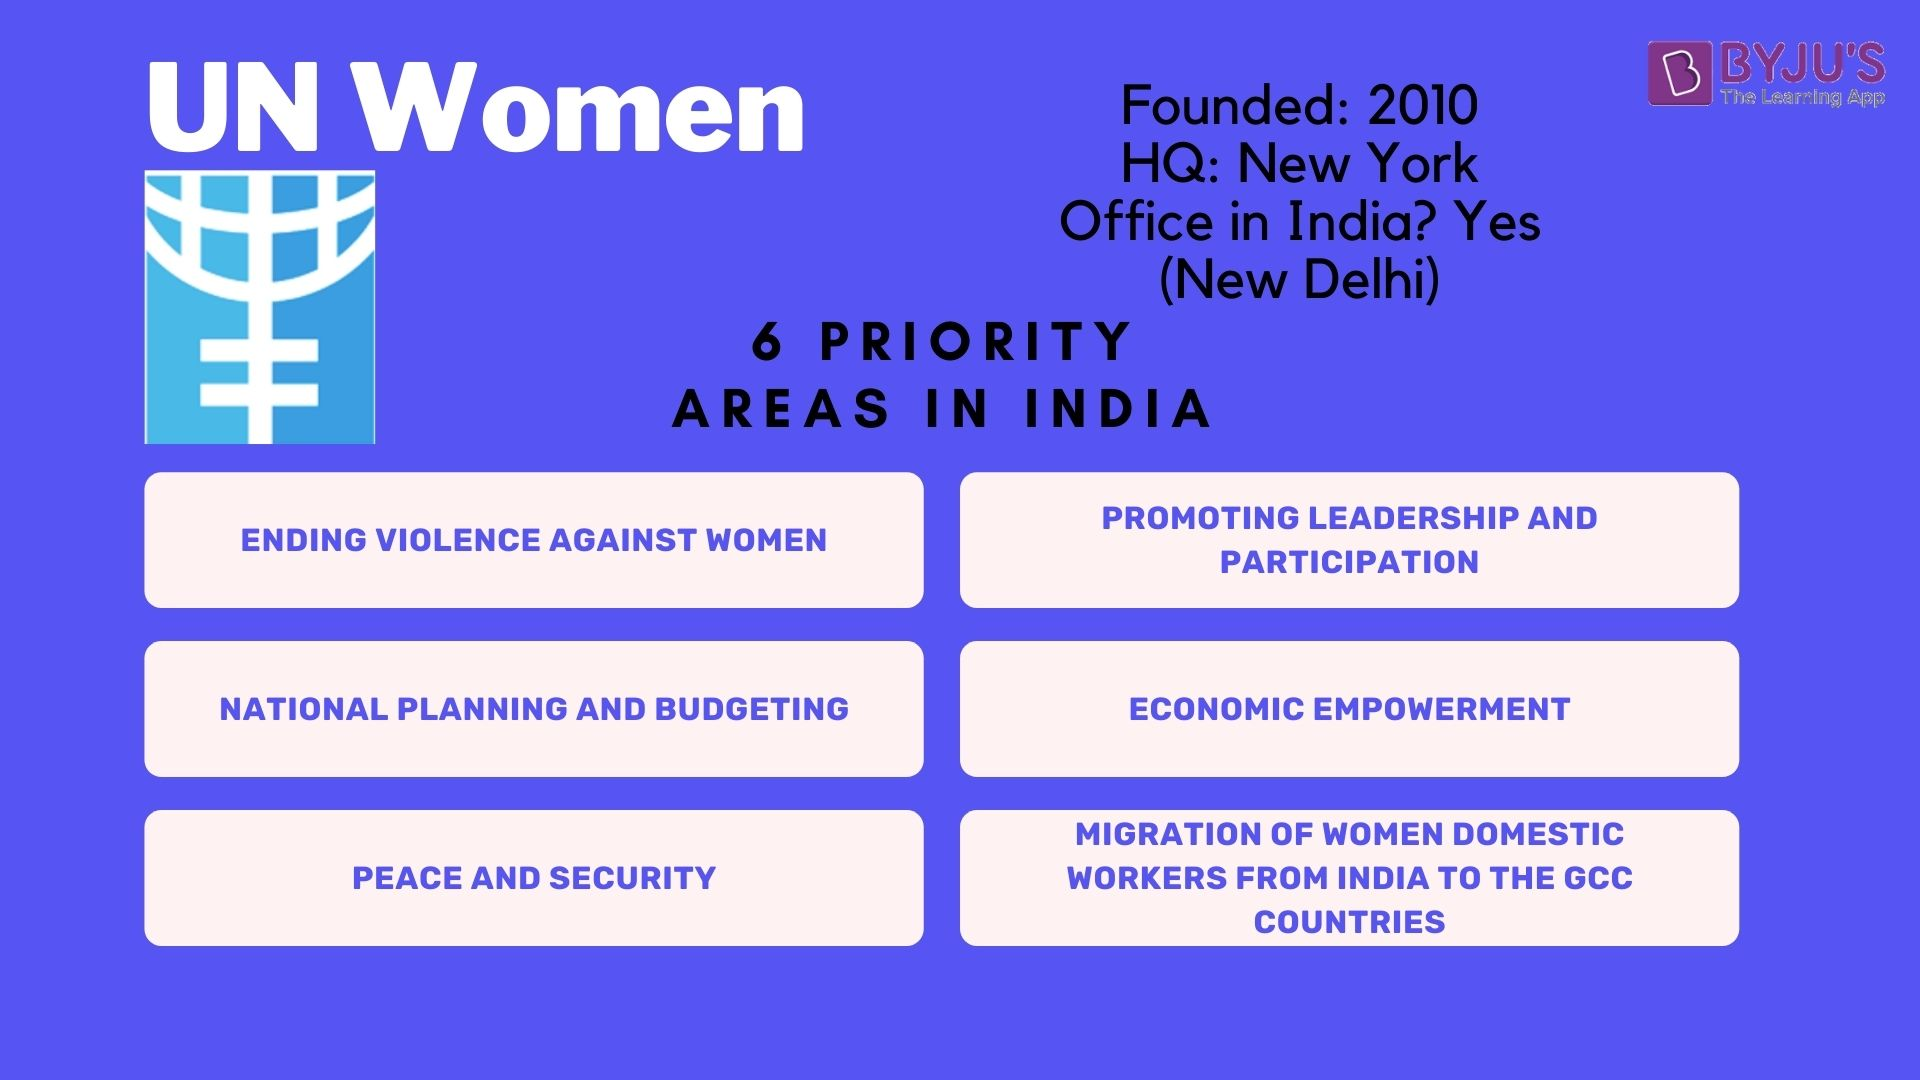 UN Women Priority Areas in India